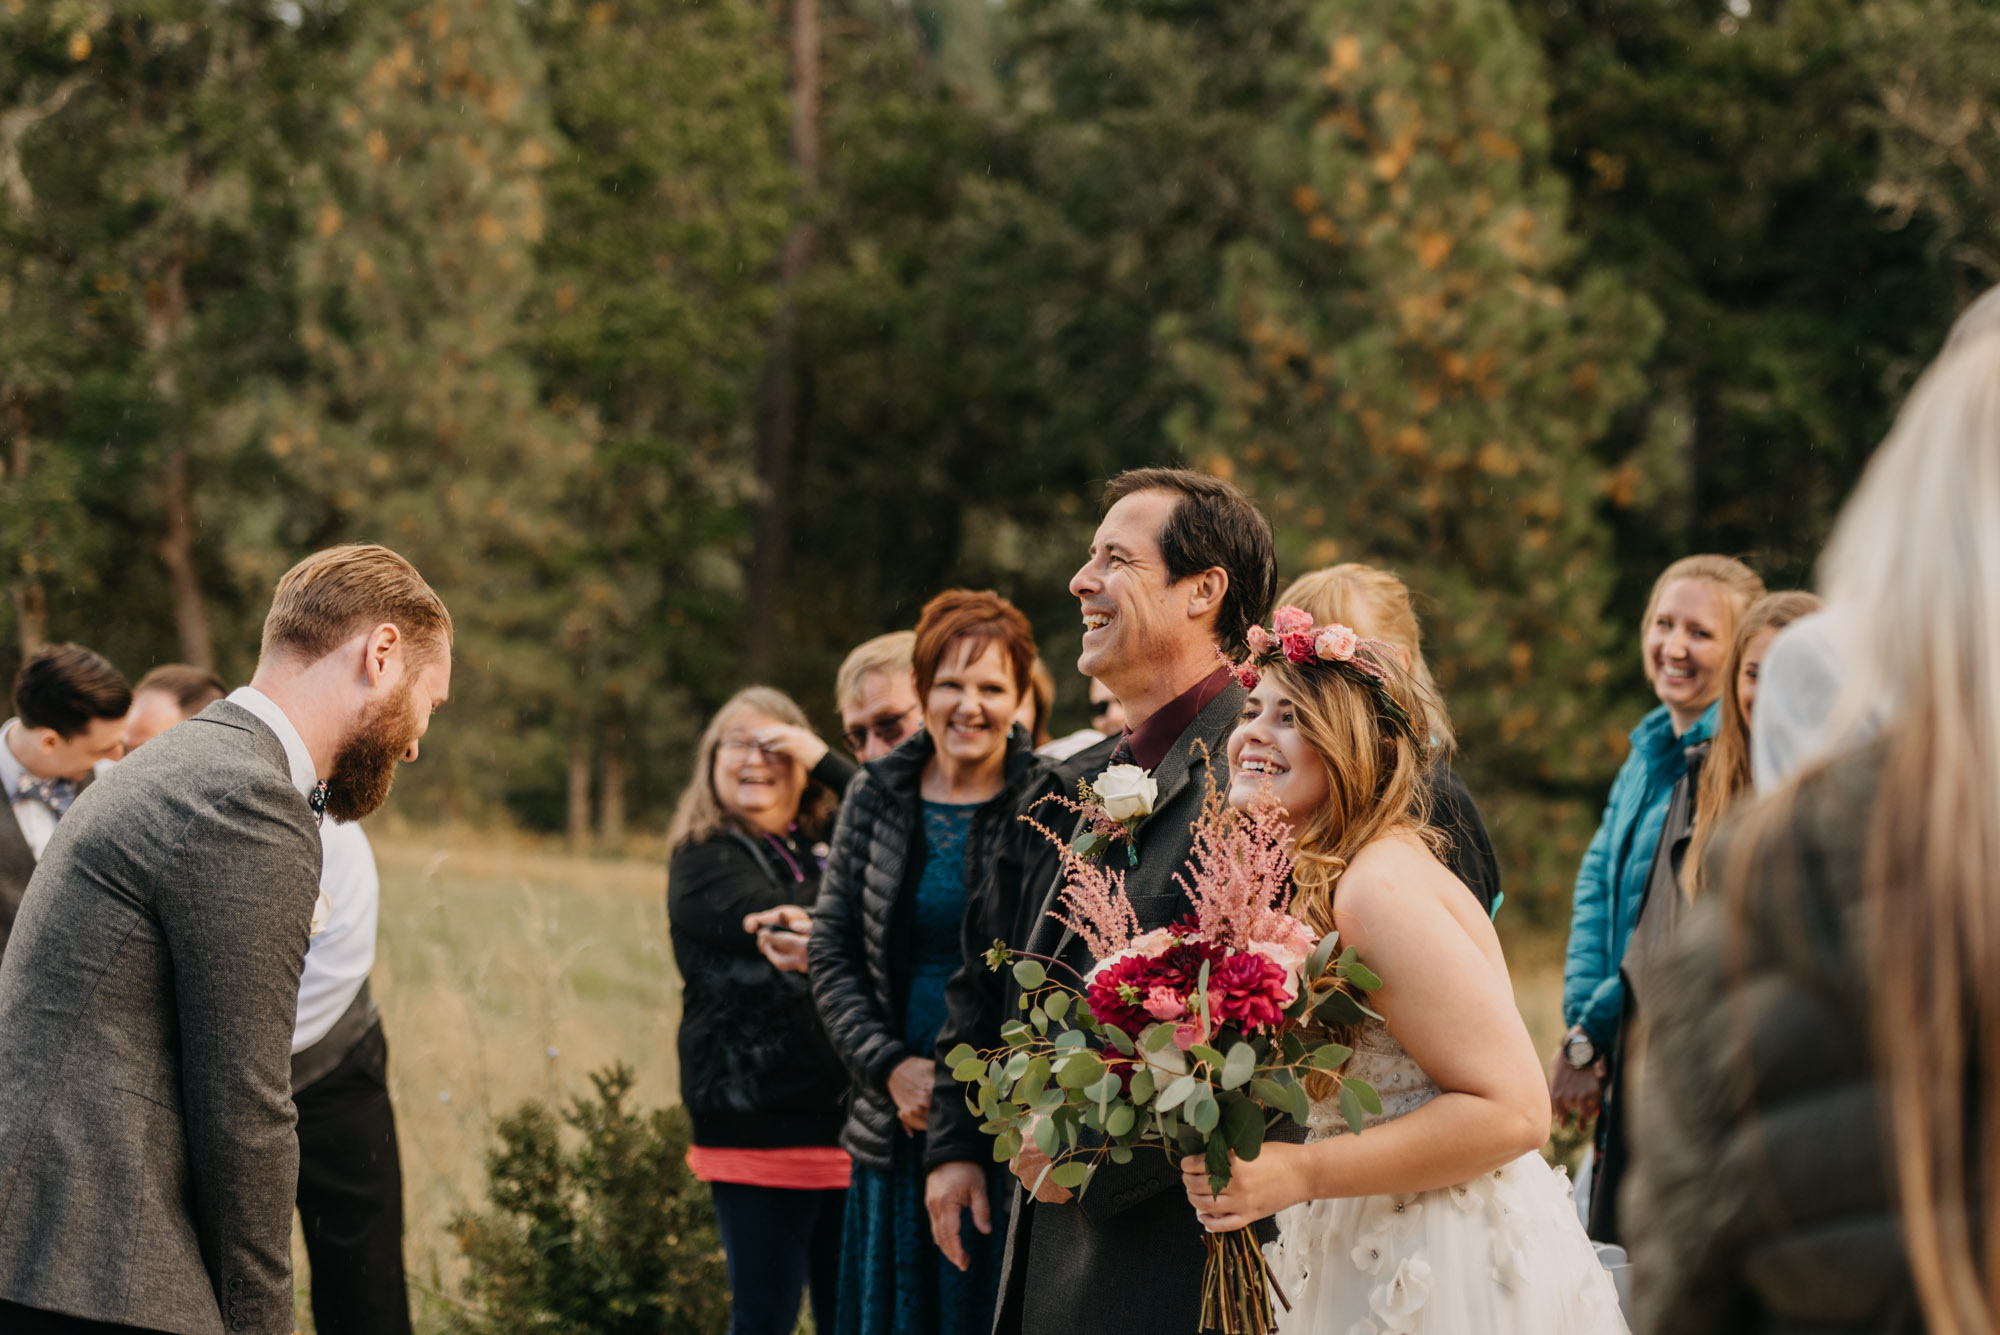 Outdoor-Summer-Ceremony-Washington-Wedding-Rainbow-8934.jpg